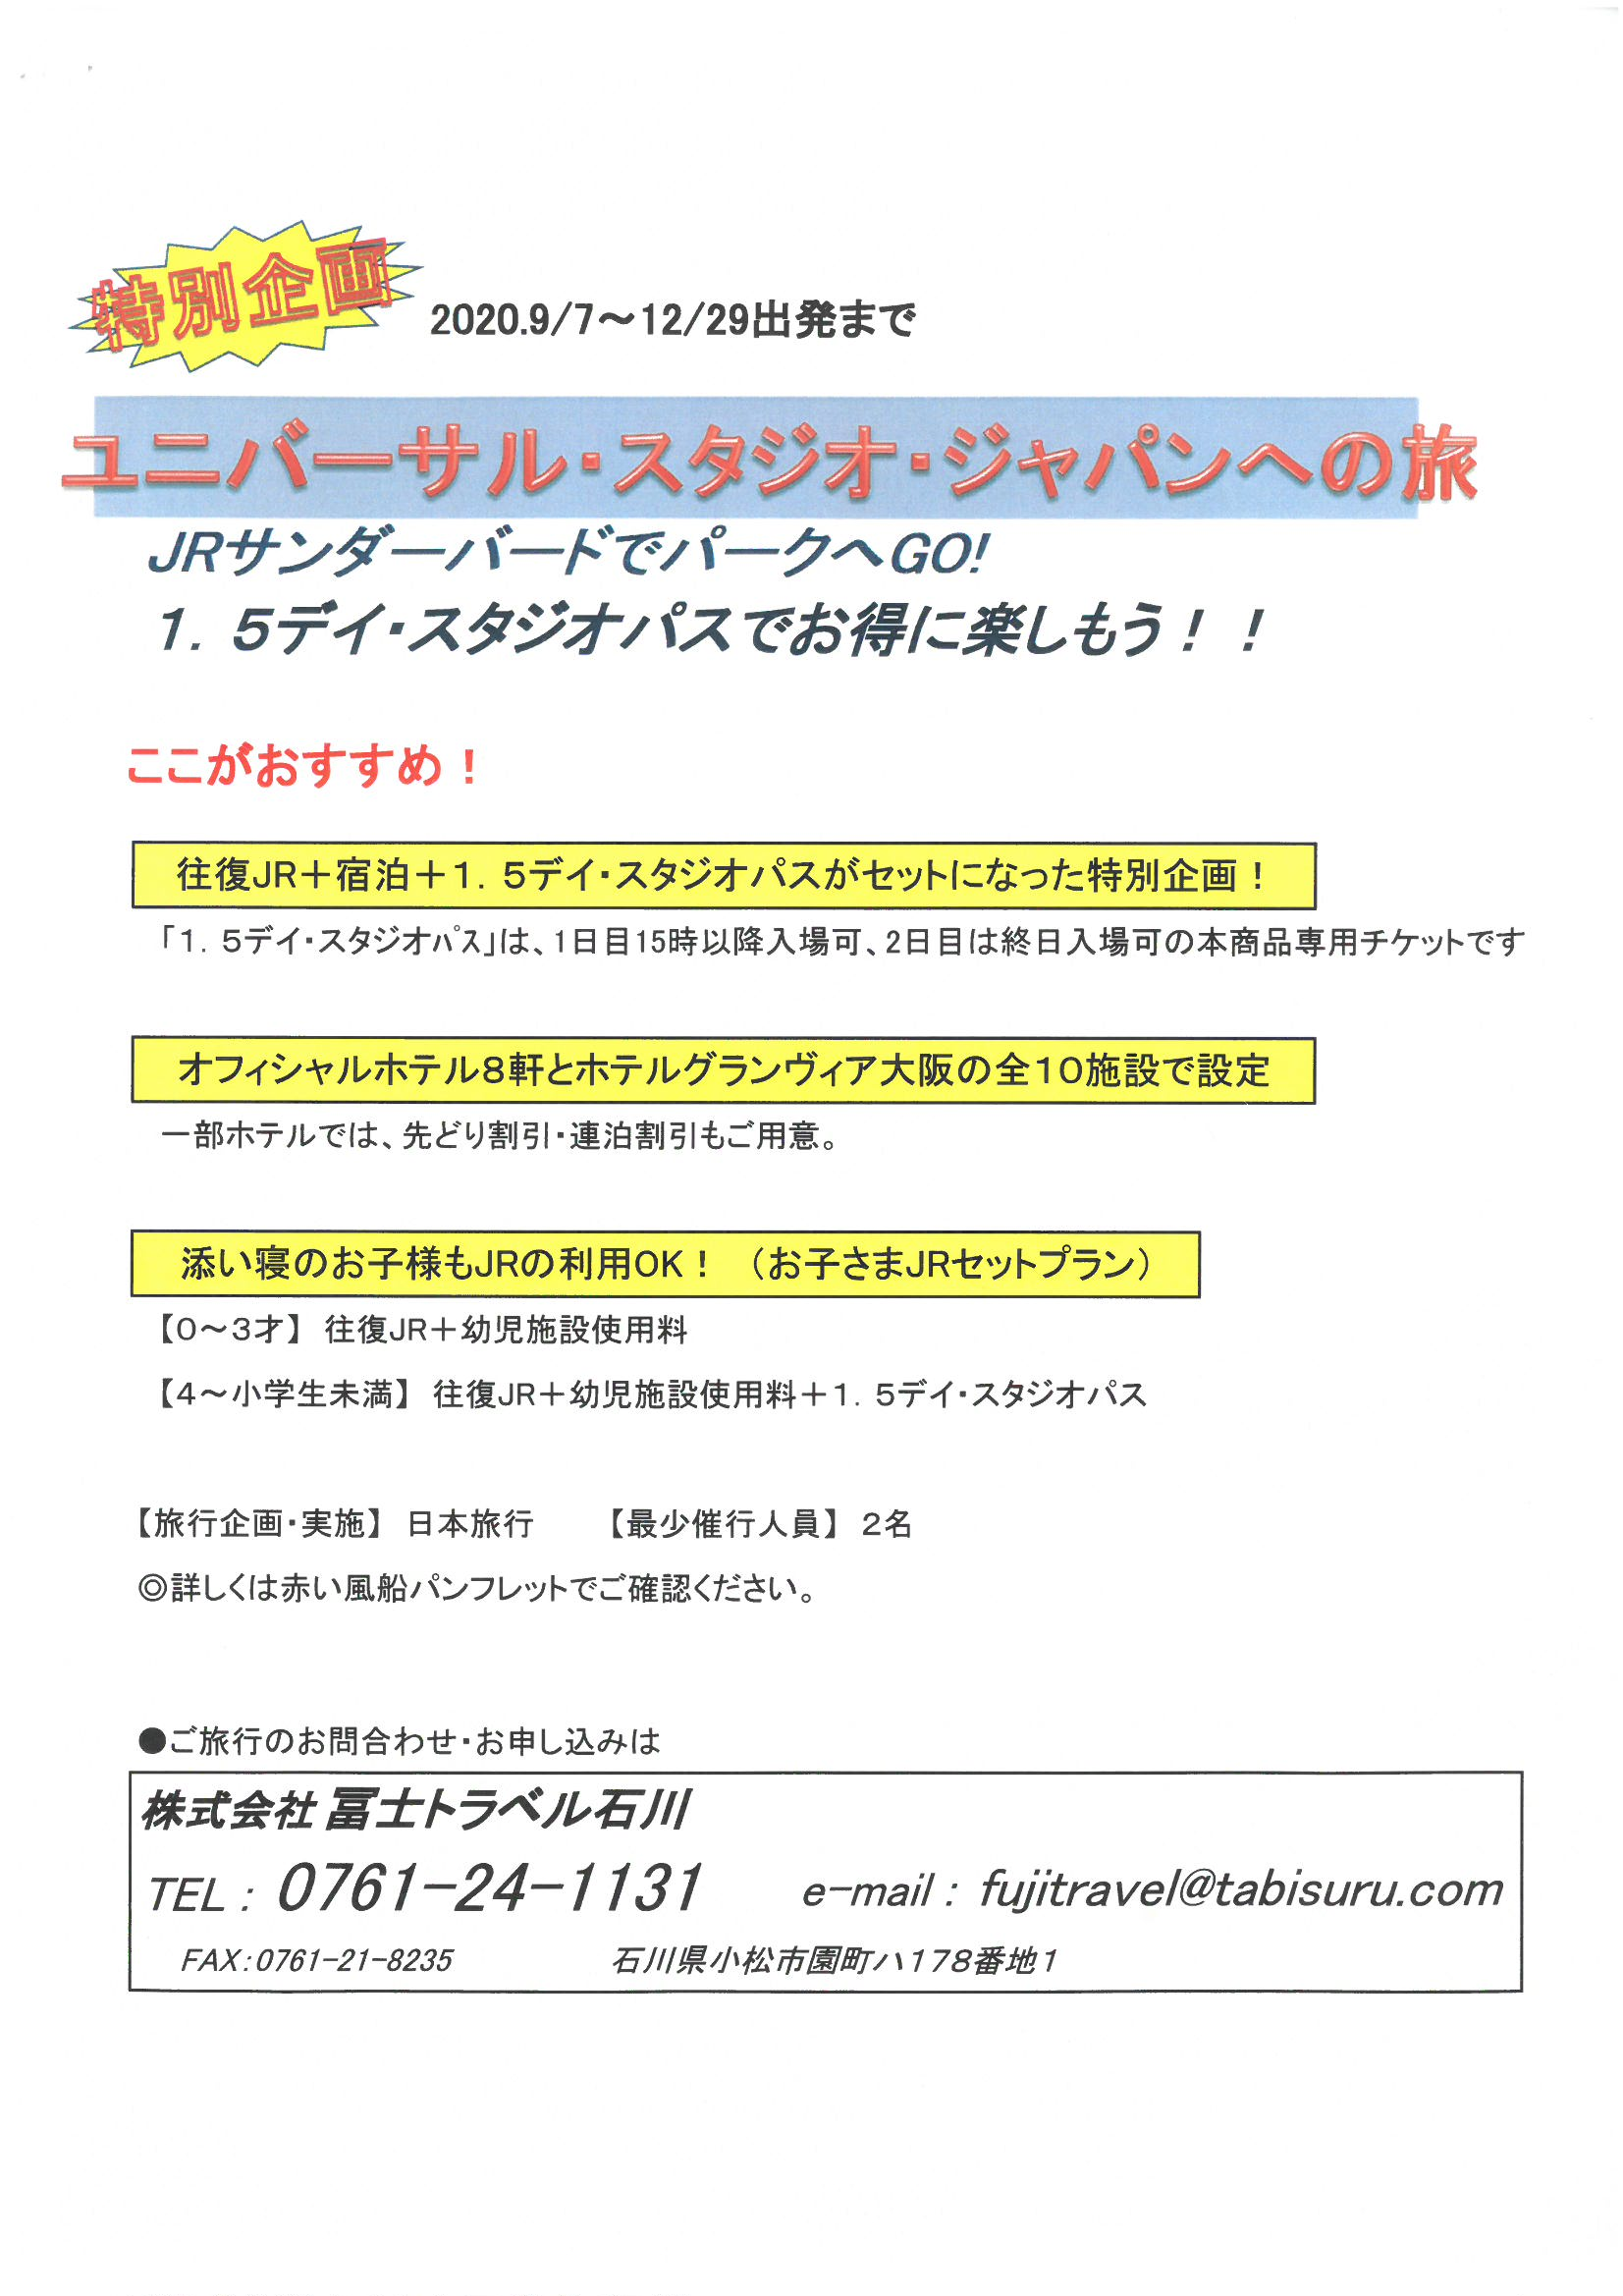 USJユニバーサルスタジオジャパン